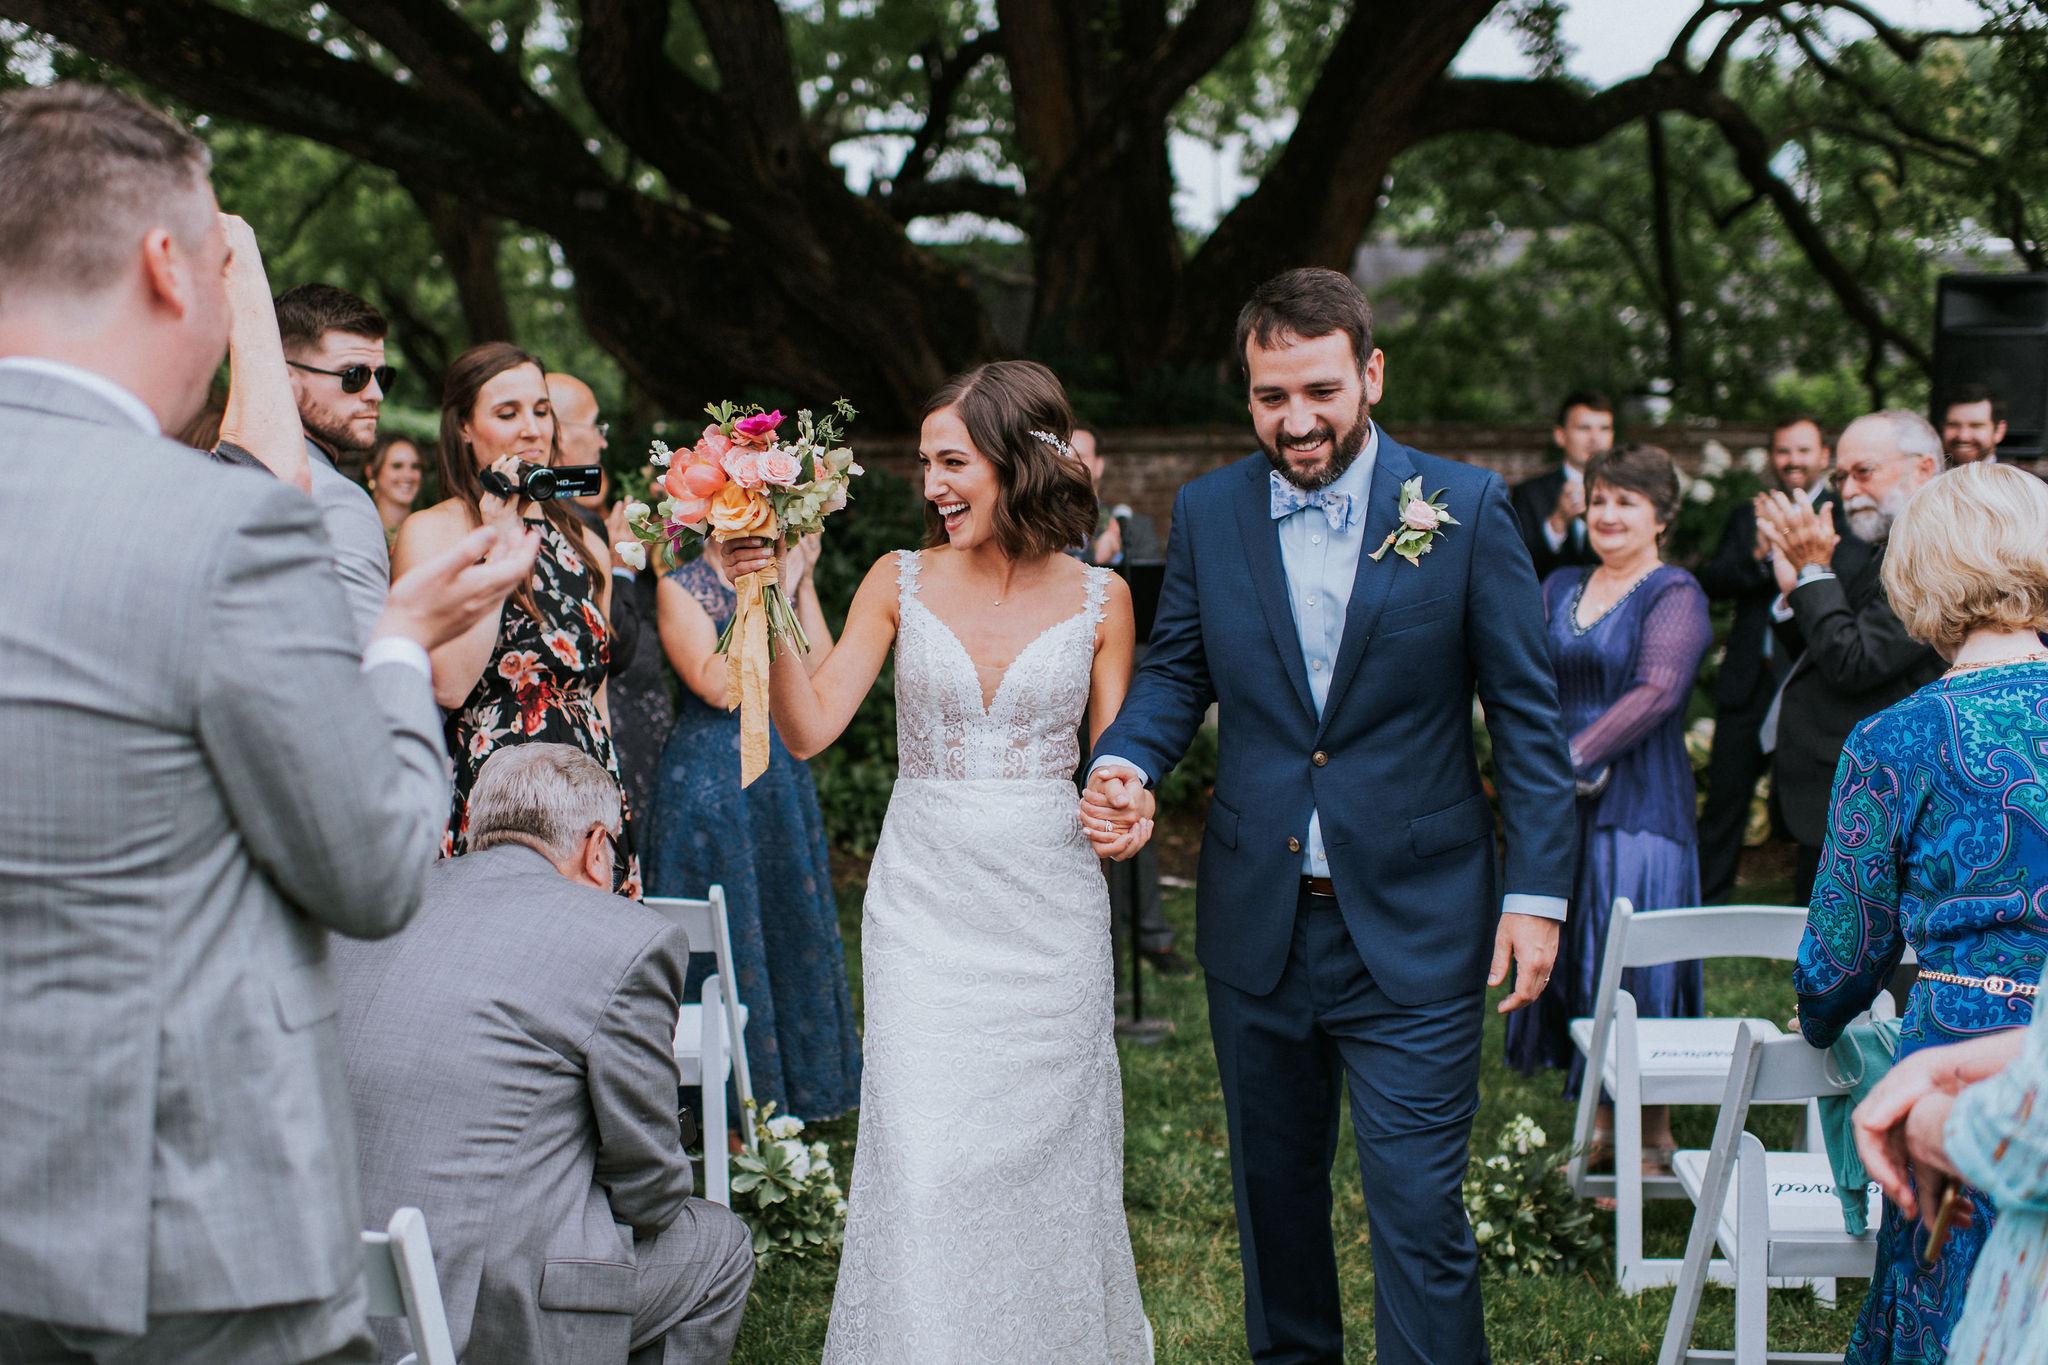 summertime dc wedding day of coordination (2).jpg